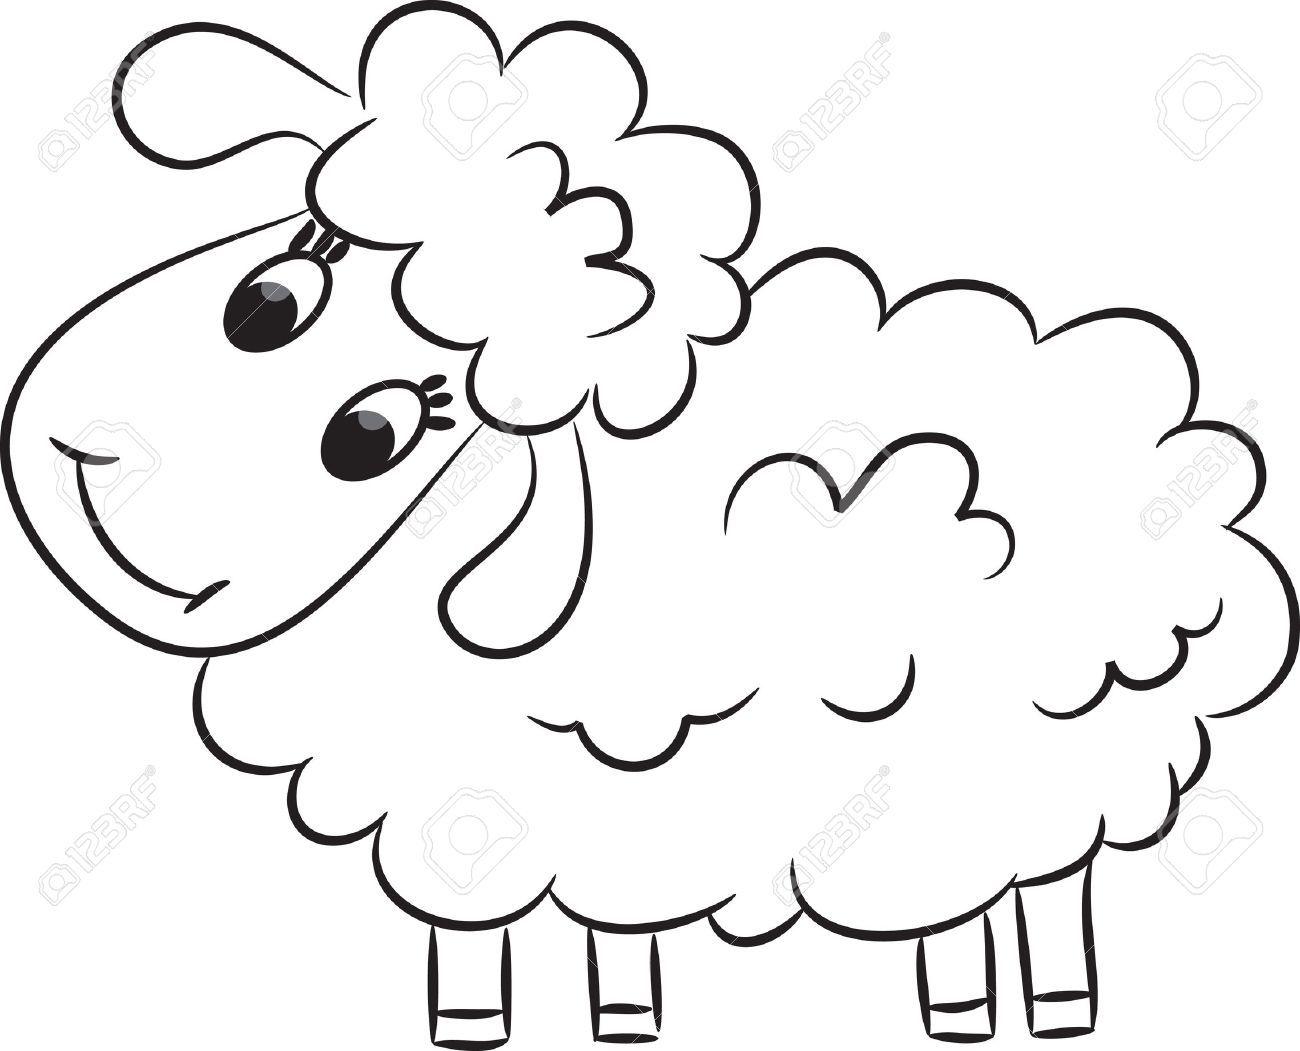 Cartoon Sheep Book Cliparts Stock Vector And Royalty Free Cartoon